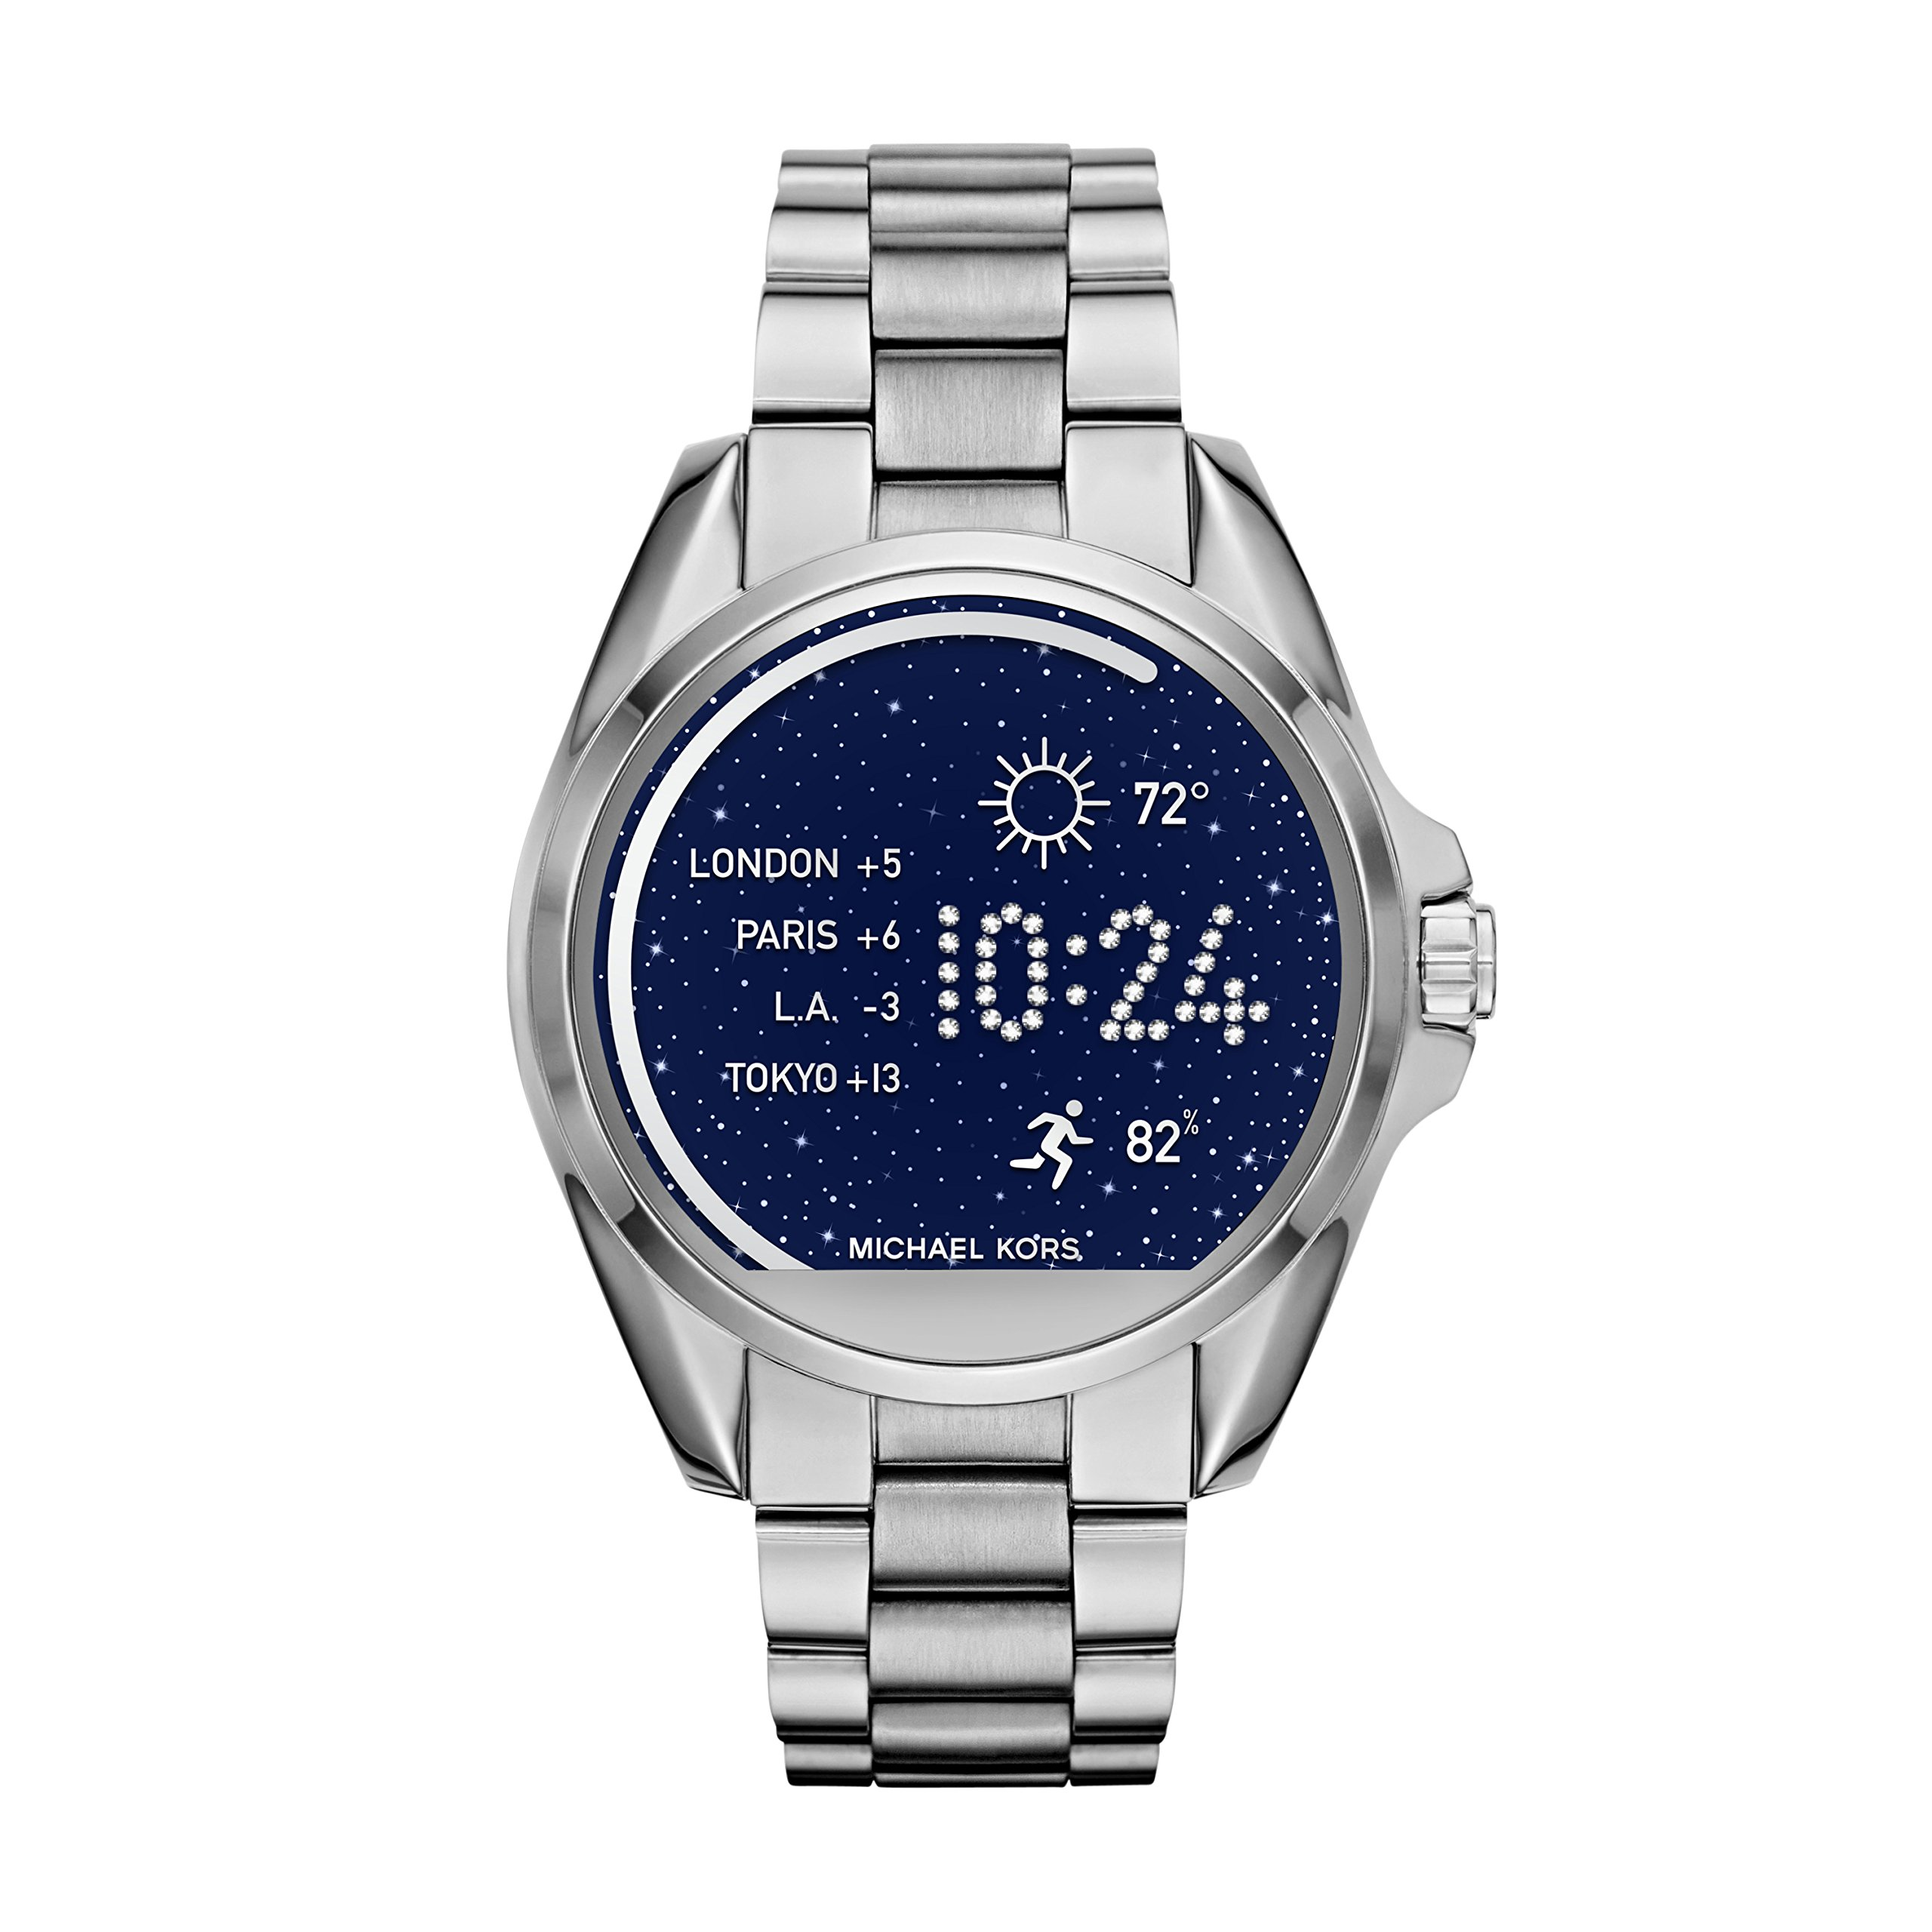 Michael Kors Access, Women's Smartwatch, Bradshaw Stainless Steel, MKT5012 by Michael Kors